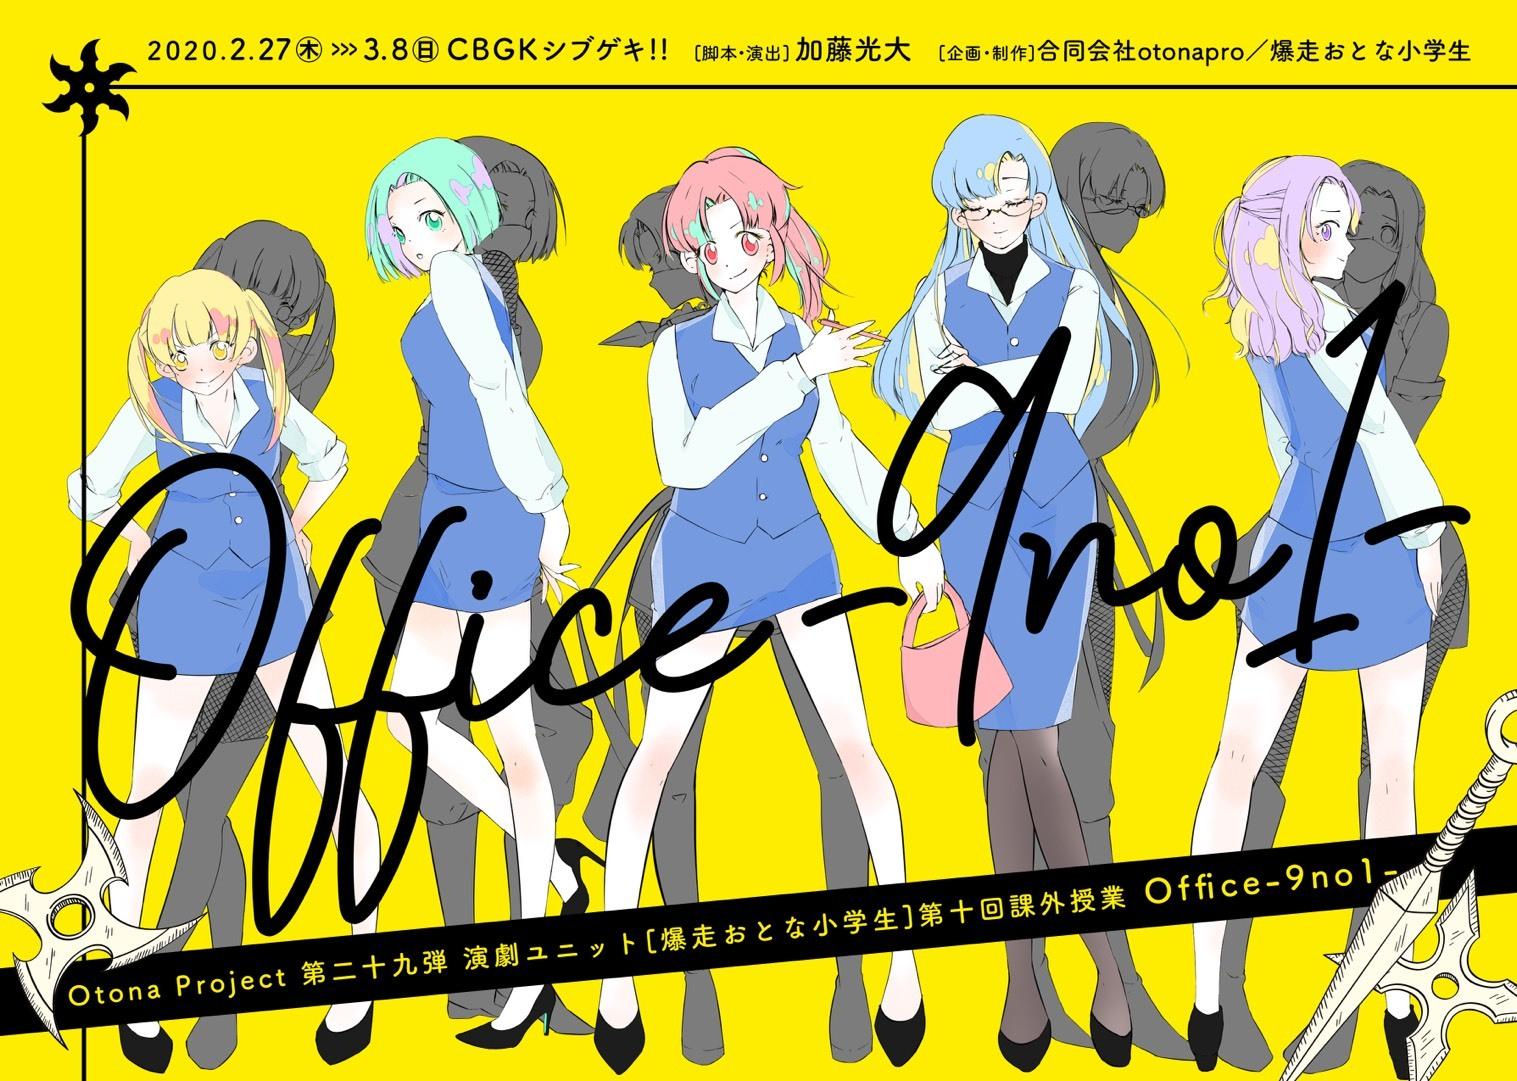 【DVD】『Office-9no1-』